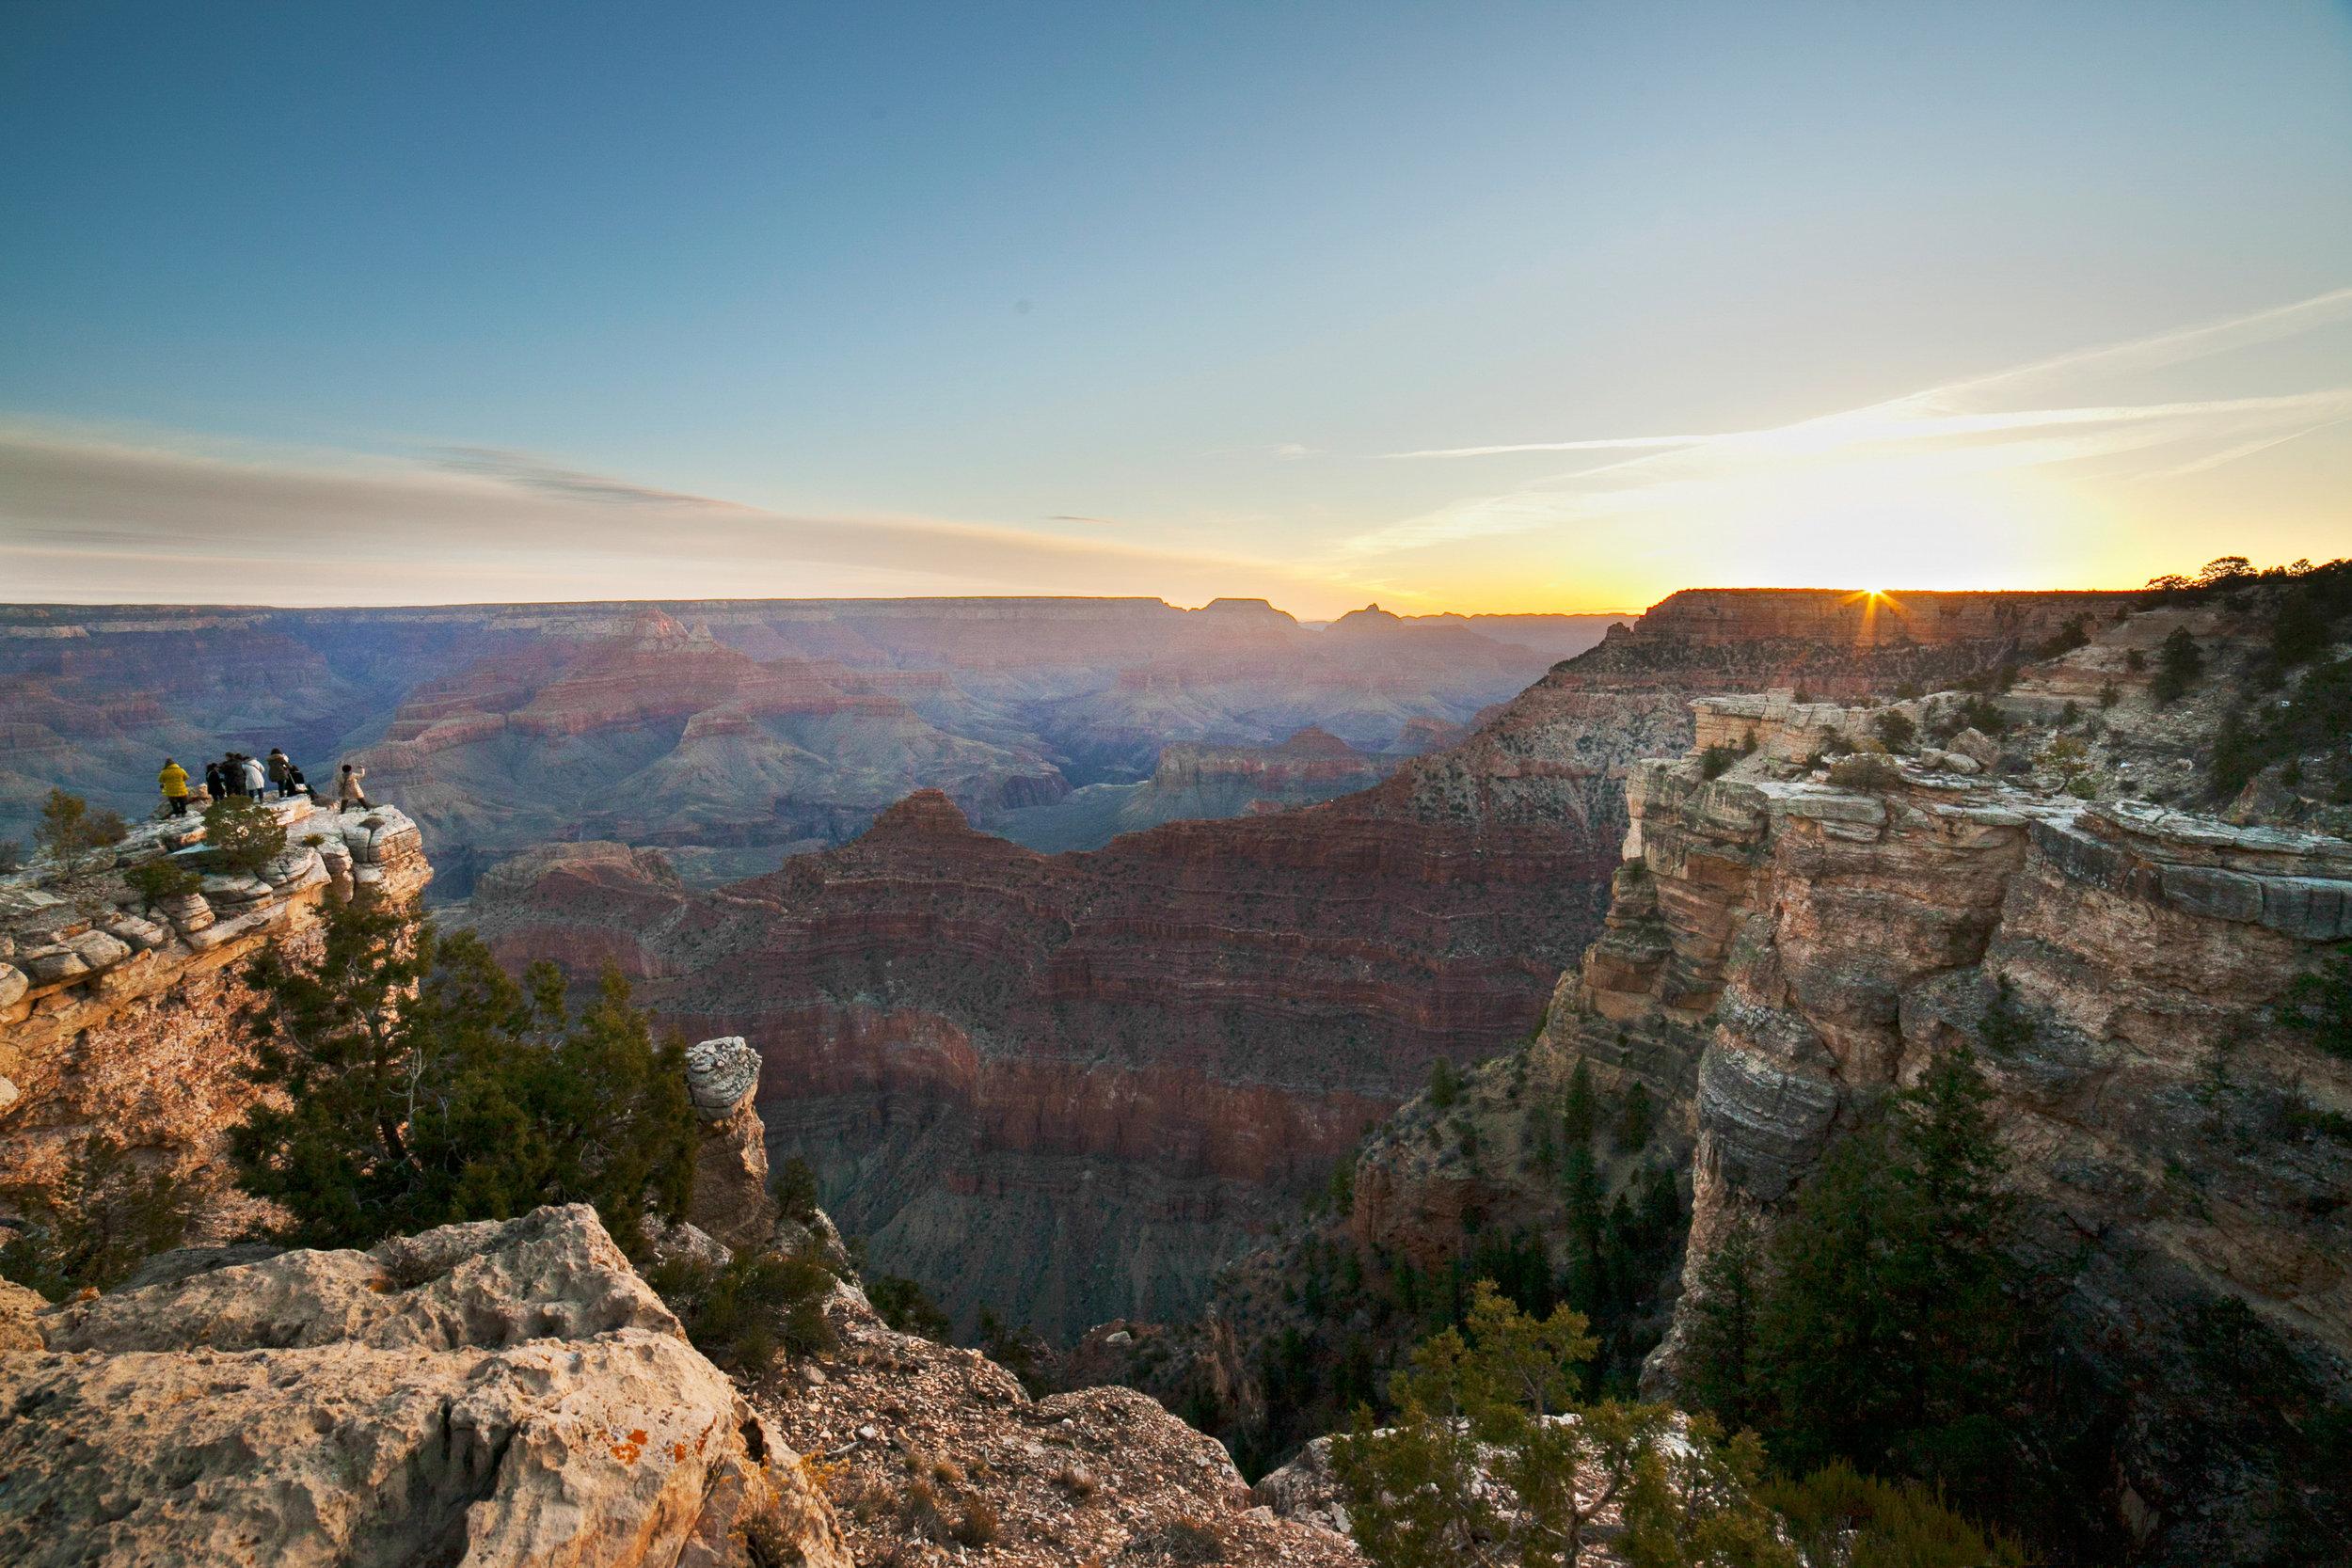 037Travel_Adventure_Photography_Outlive_Creative_Grand_Canyon_Arizona.jpg